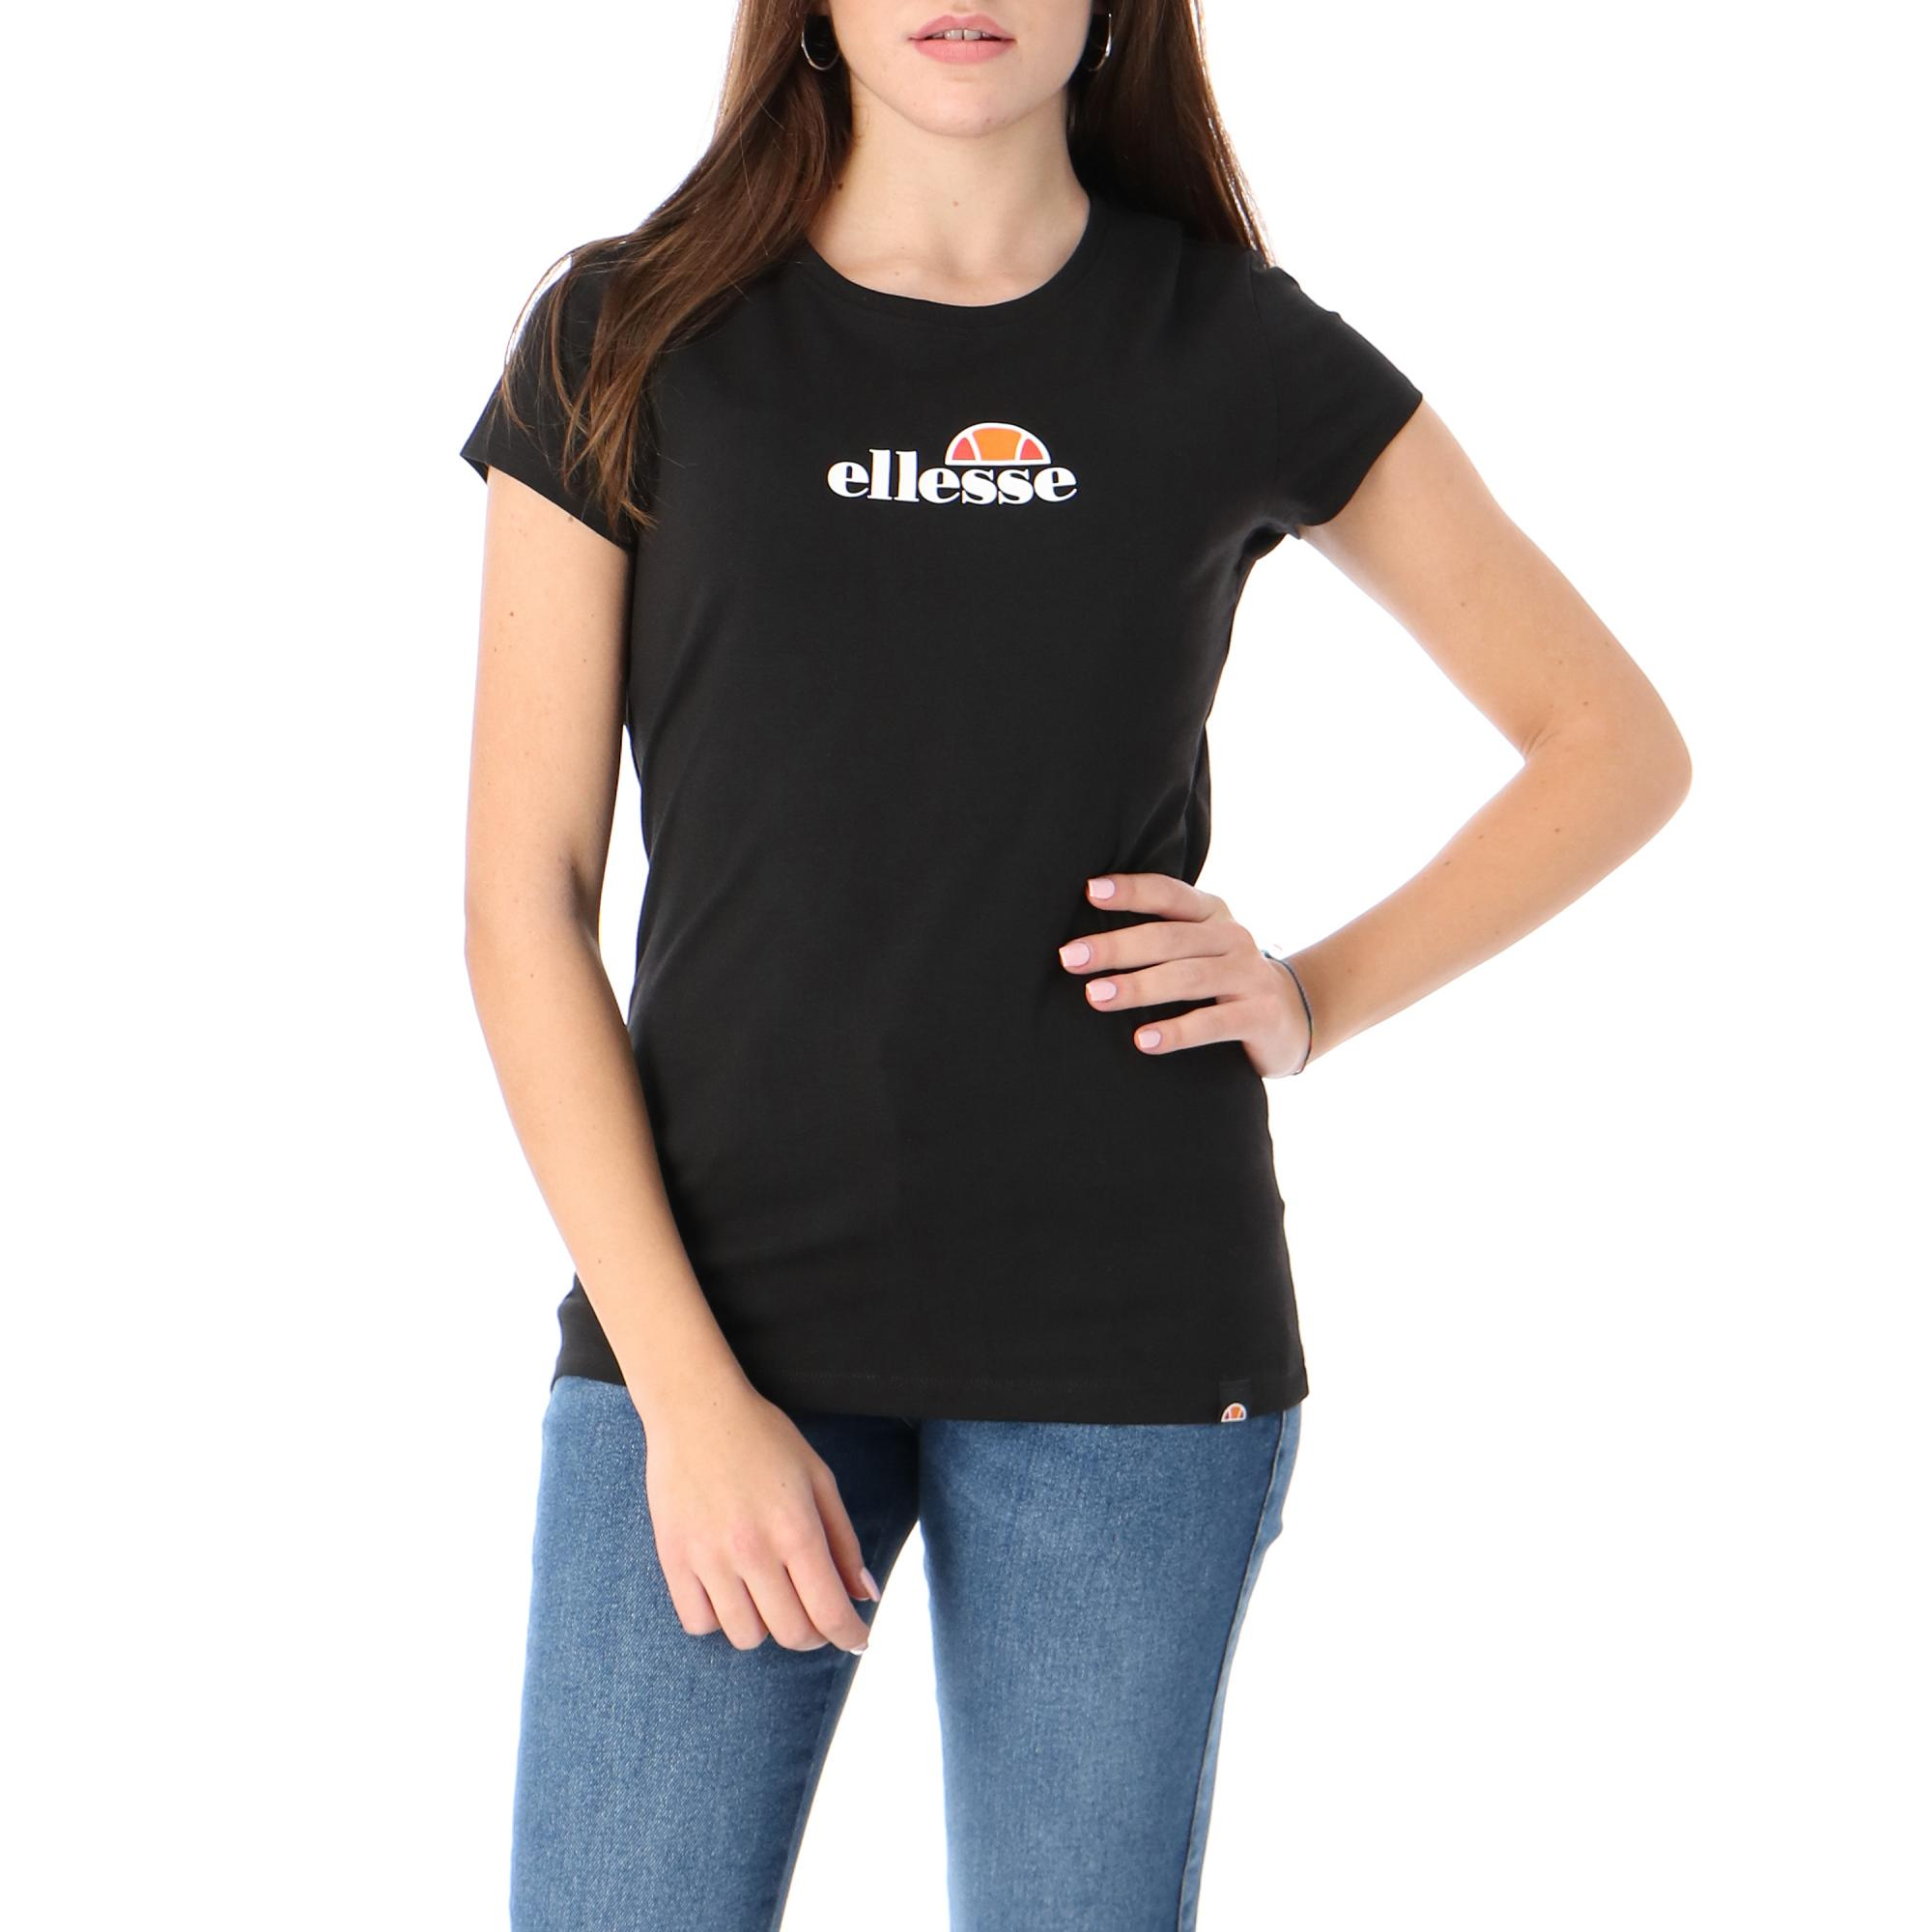 Ellesse T-shirt Ss Black